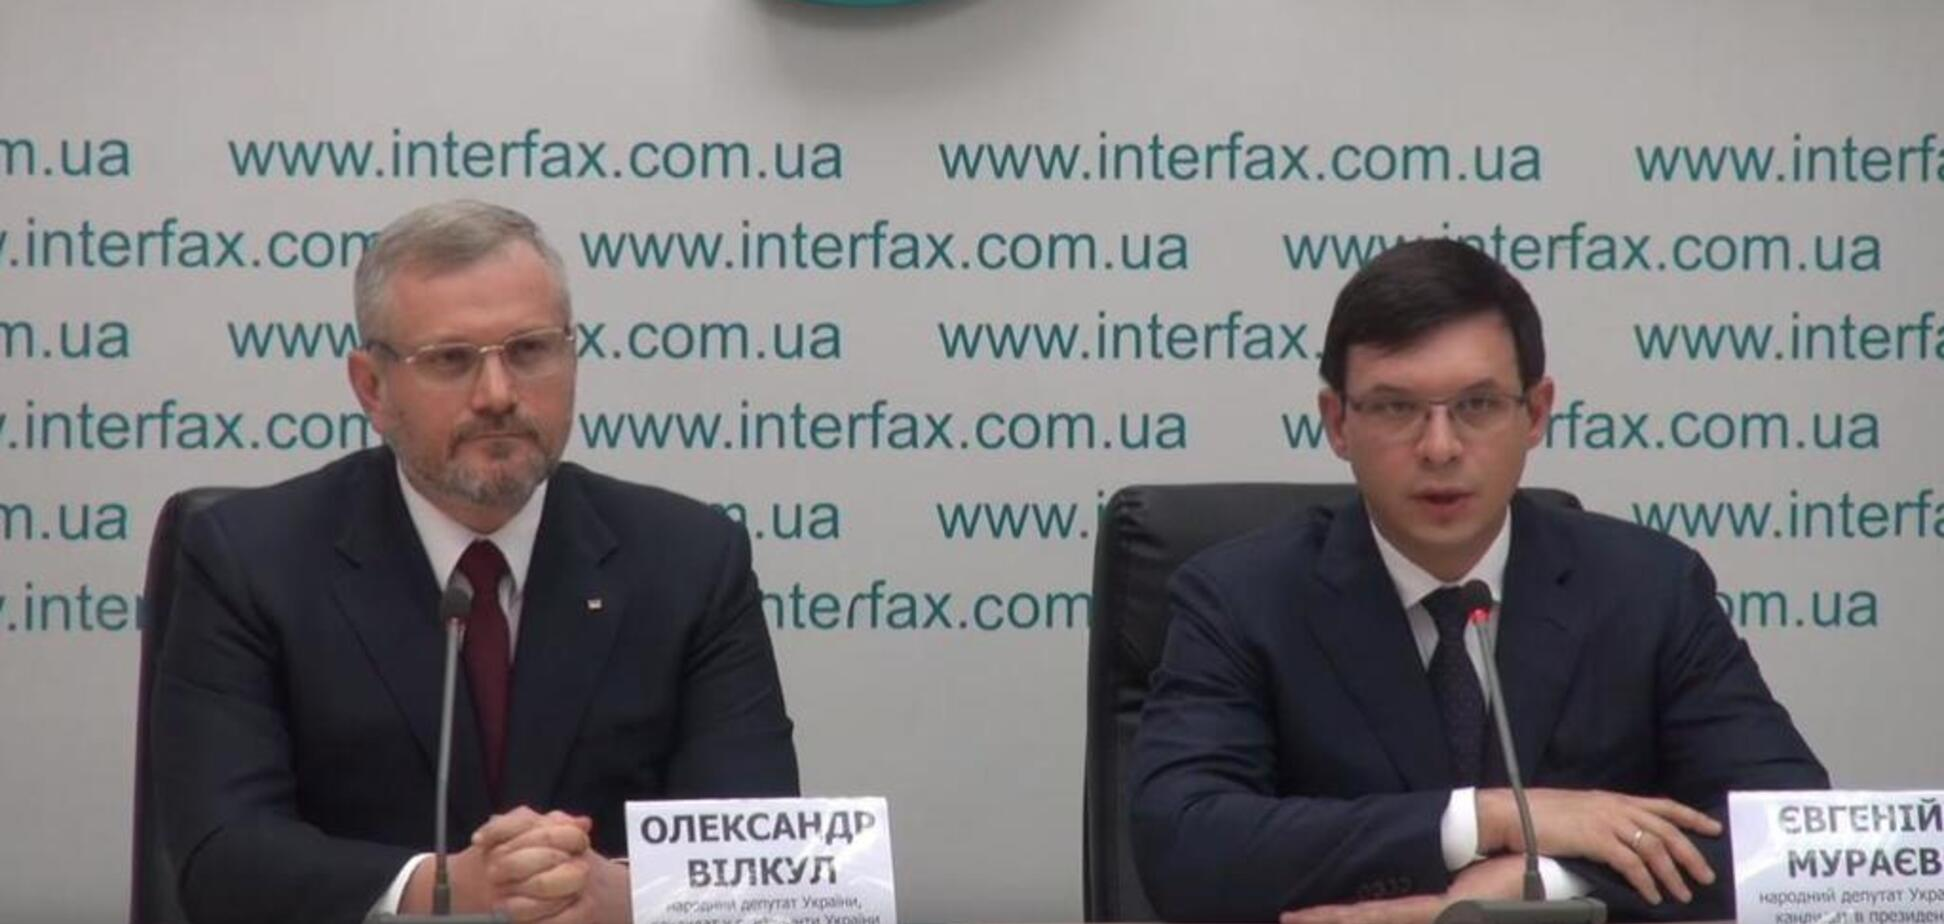 Мураев снял свою кандидатуру на выборах президента в пользу Вилкула